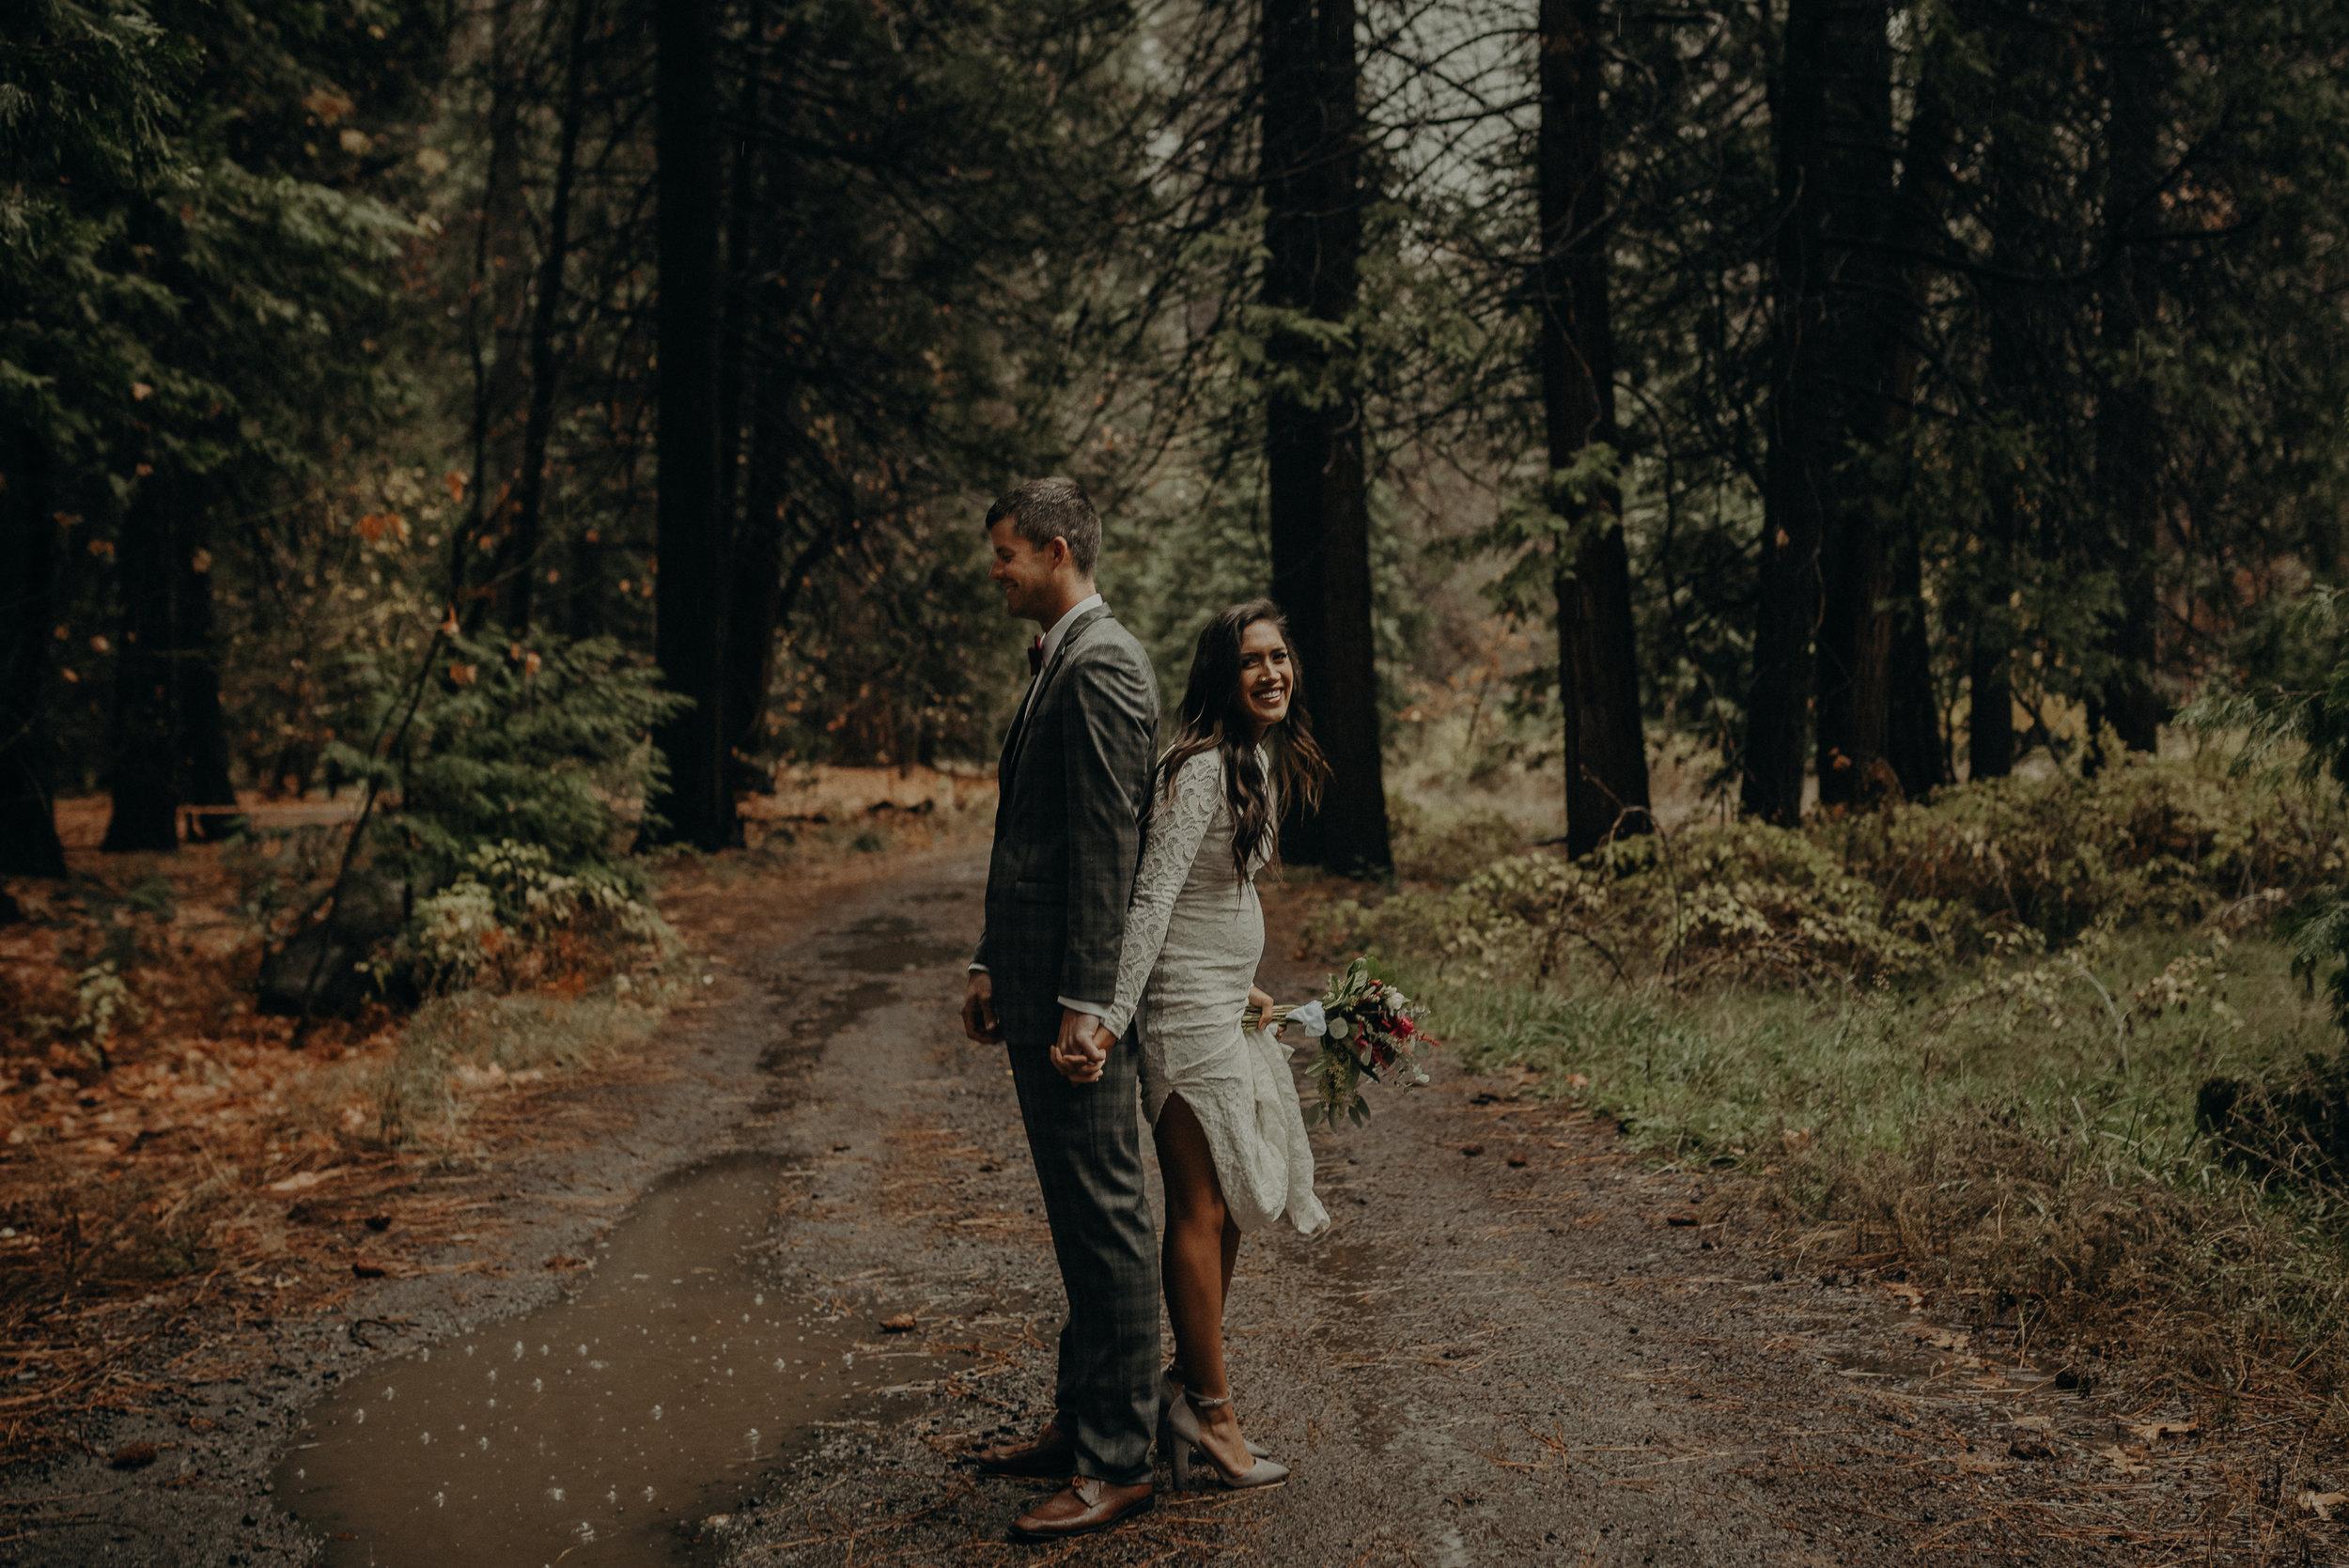 Isaiah + Taylor Photography - Yosemite Elopement - Los Angeles Wedding Photographer-11.jpg